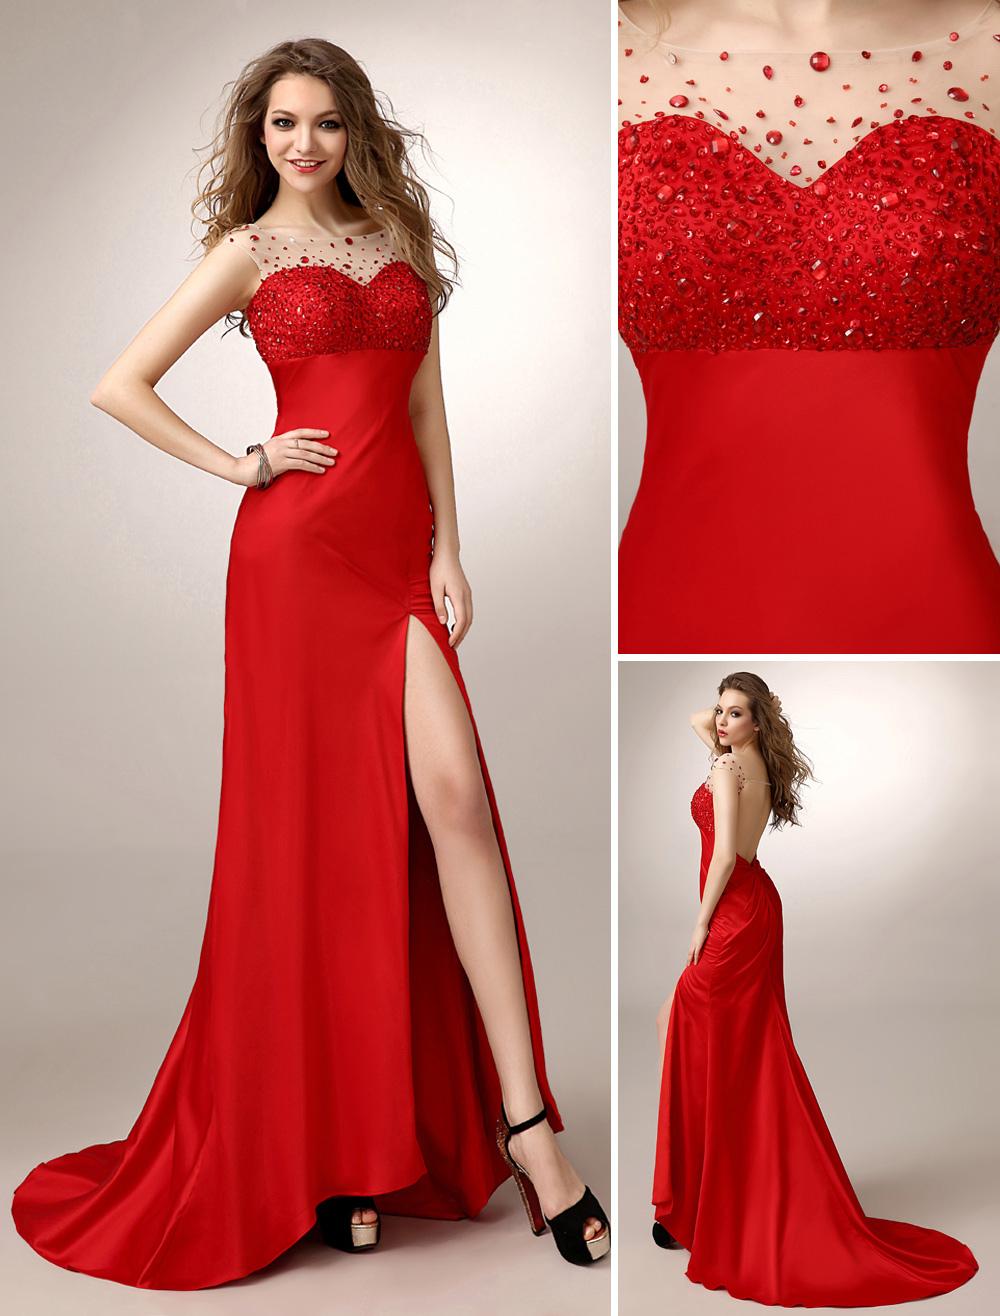 Red Prom Dresses 2018 Long Mermaid Backless Evening Dress Rhinestone Illusion High Split Satin Party Dress With Train (Wedding) photo